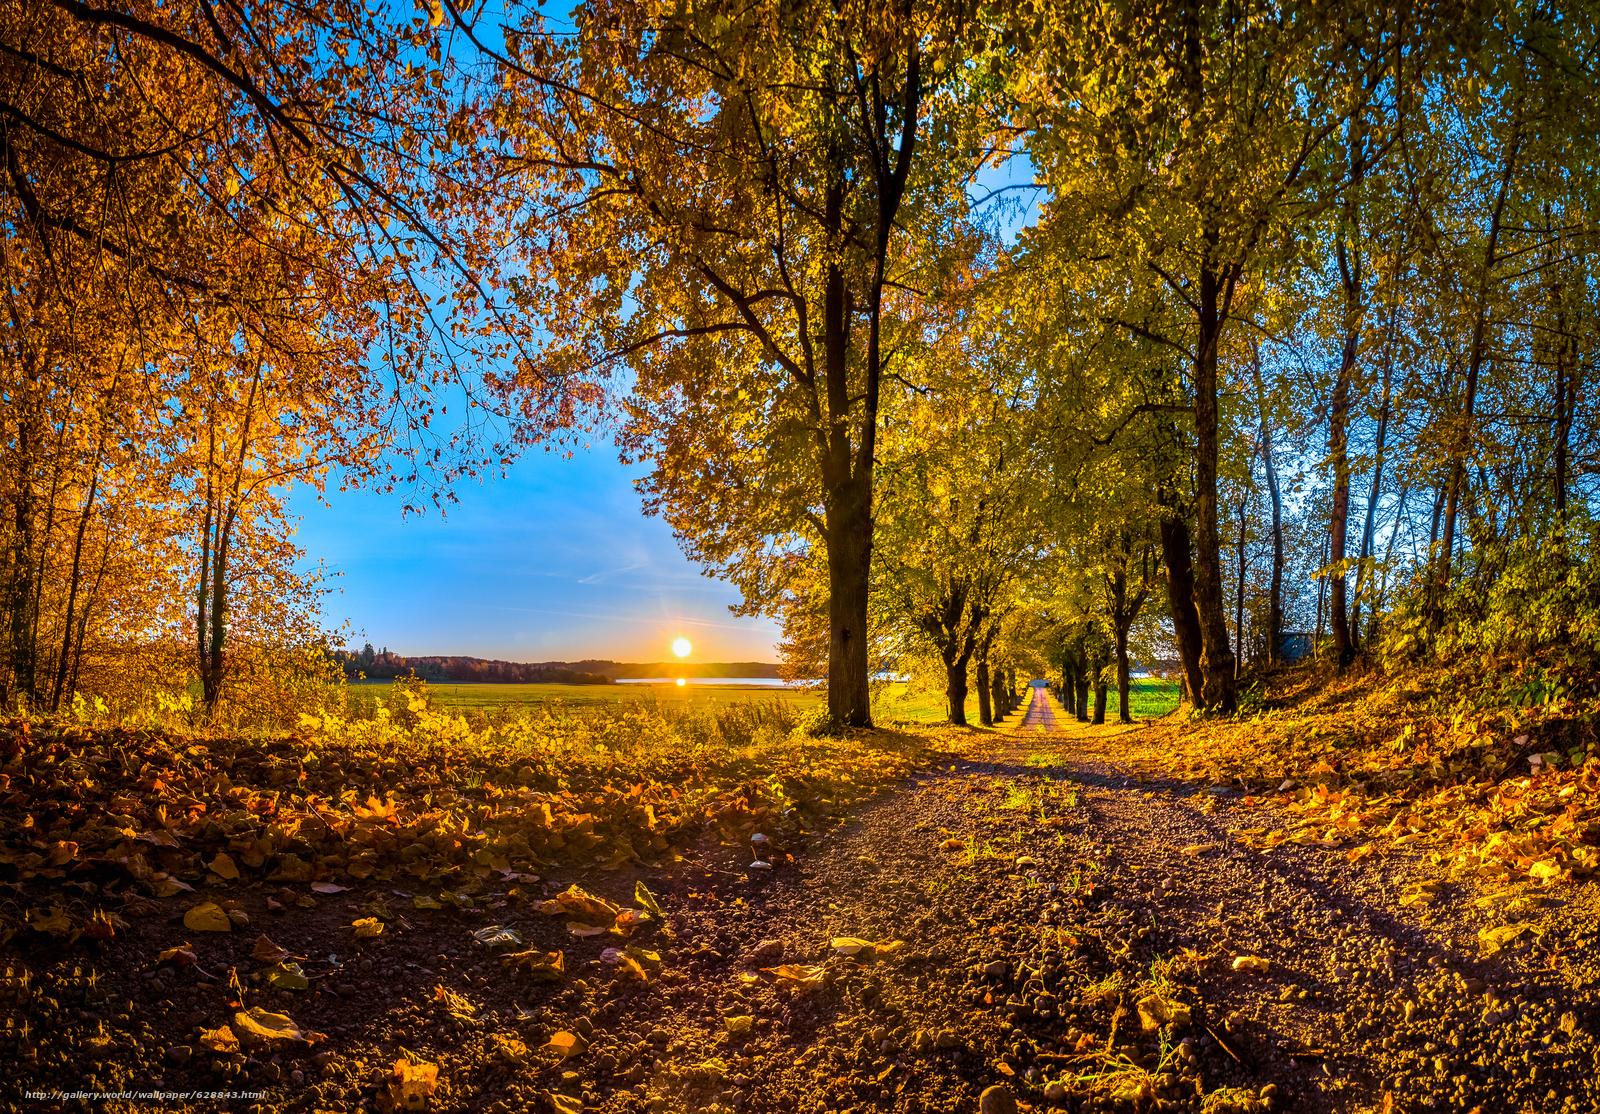 осень, закат, лес, дорога, деревья, пейзаж